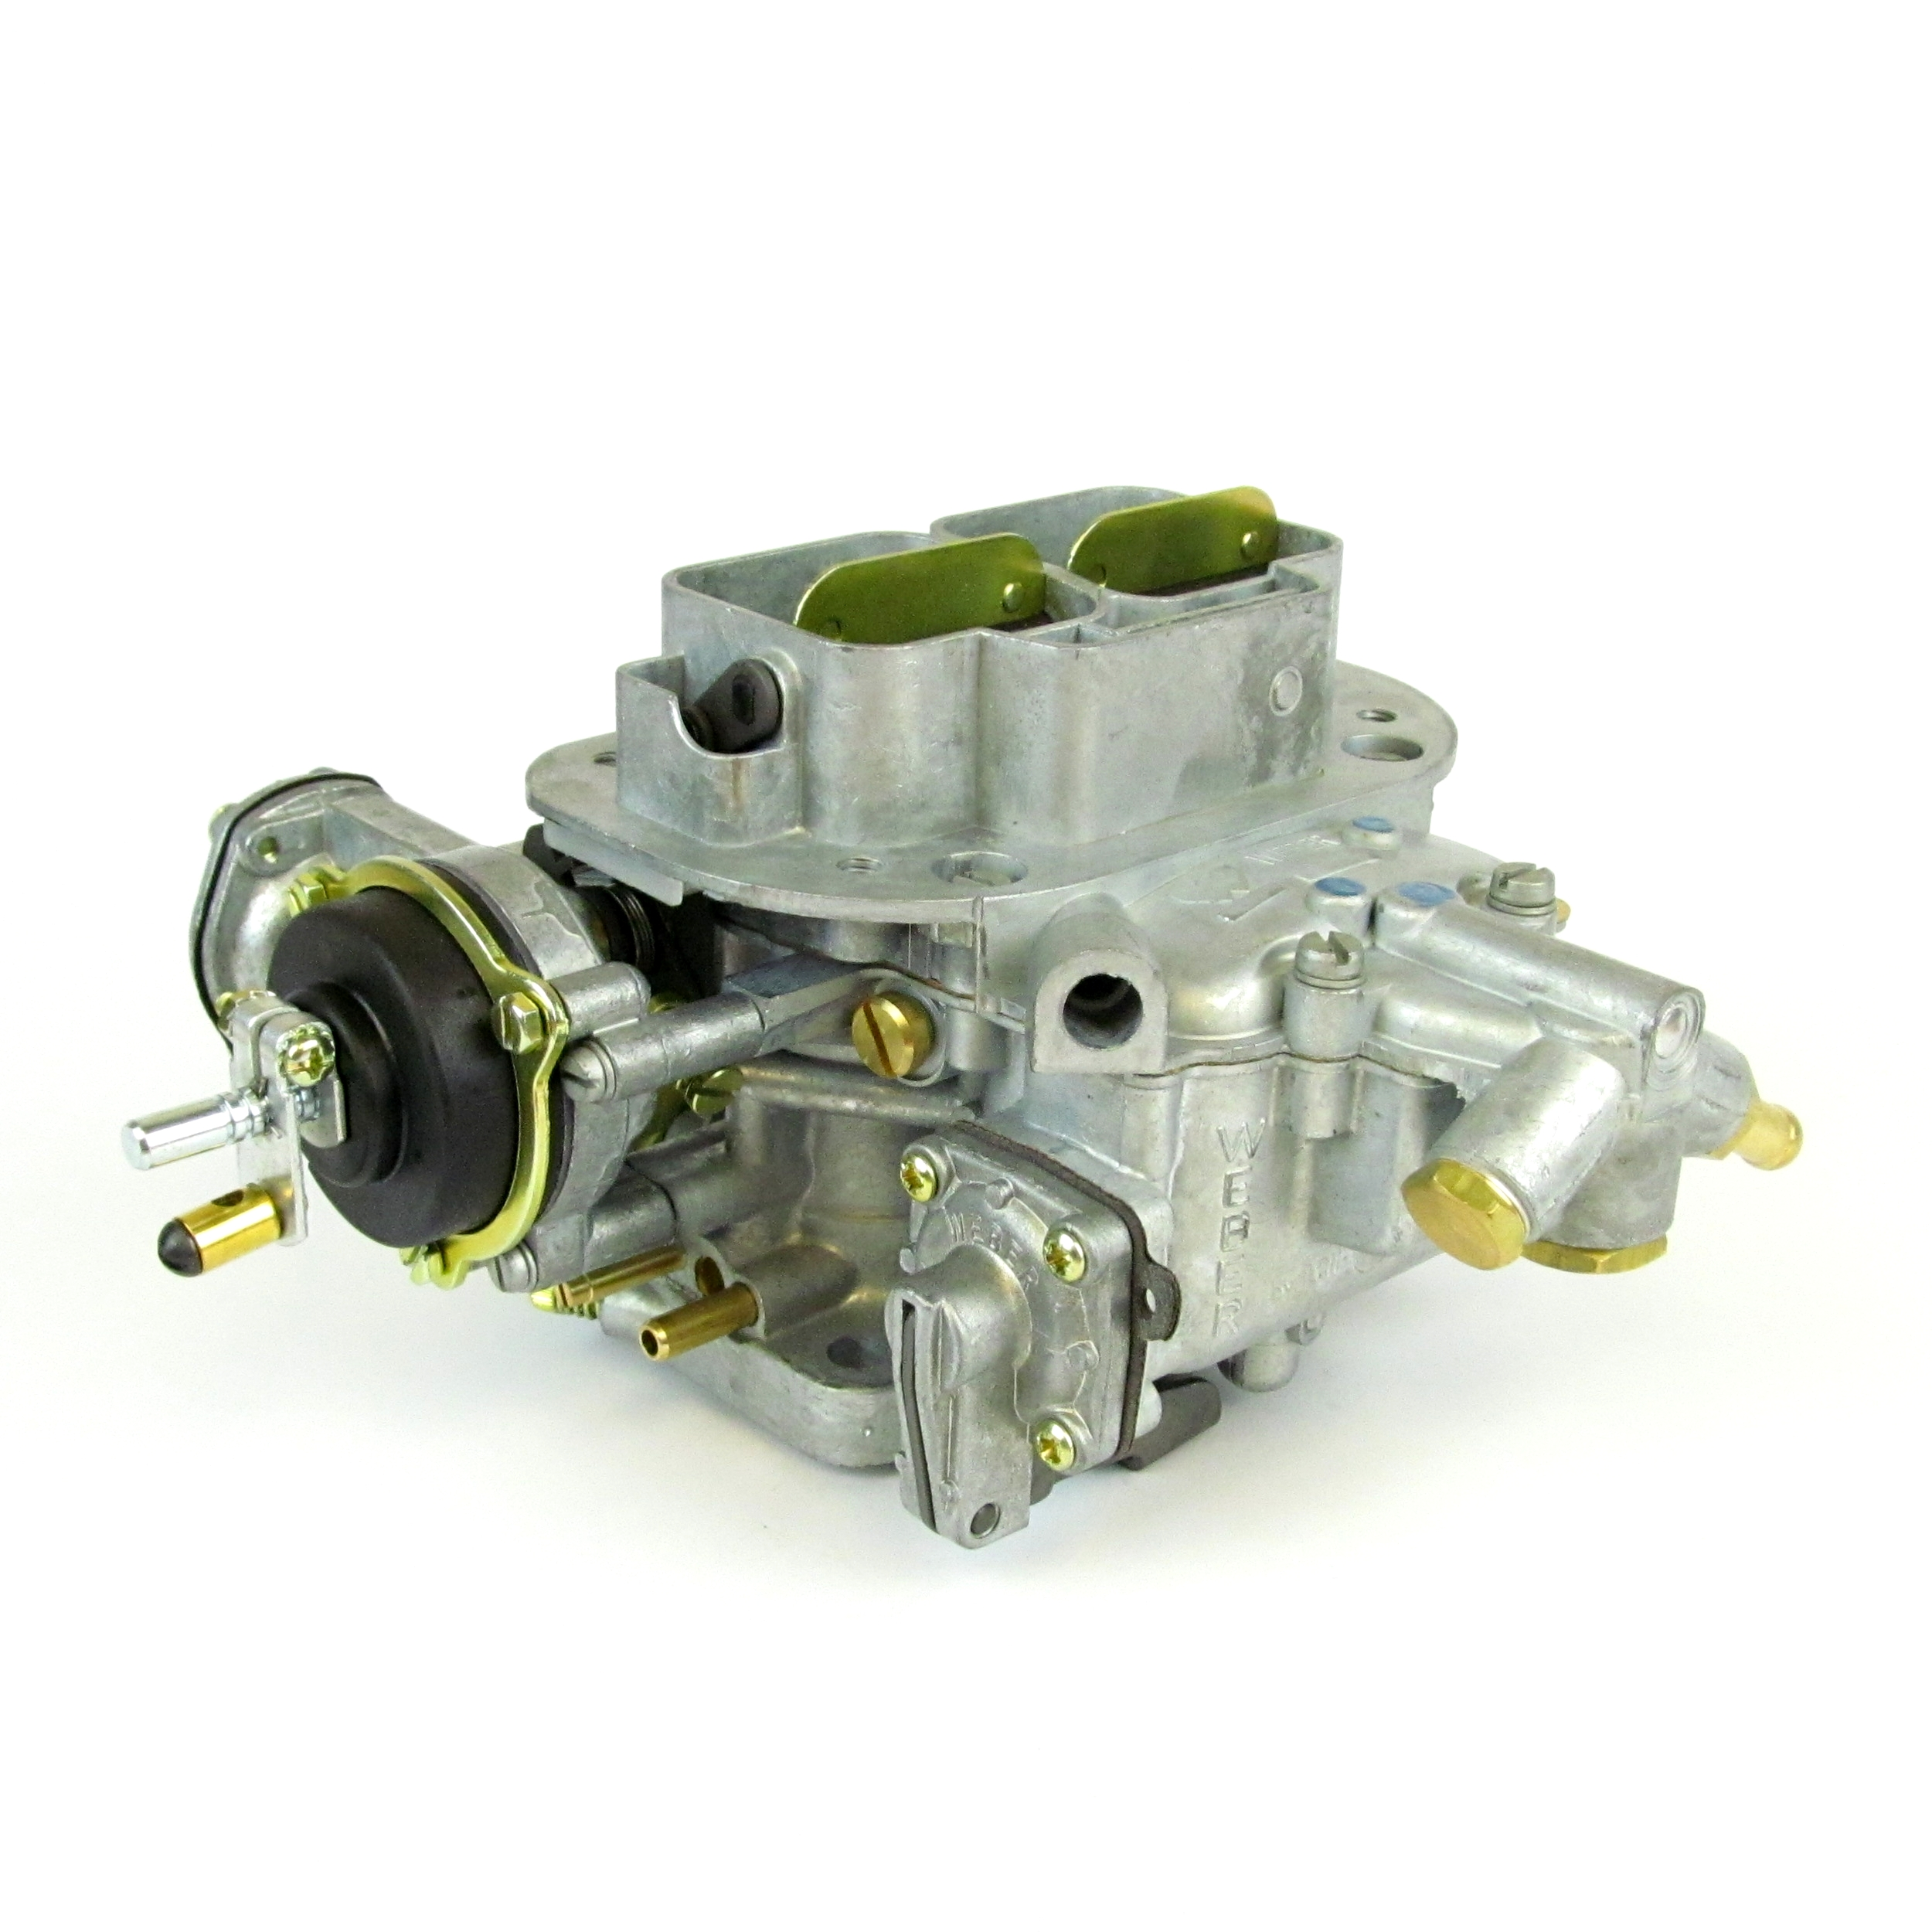 weber 32 36 dgav 38 dgas carburettor manual choke conversion kit rh classiccarbs co uk  weber carburetor manual choke adjustment